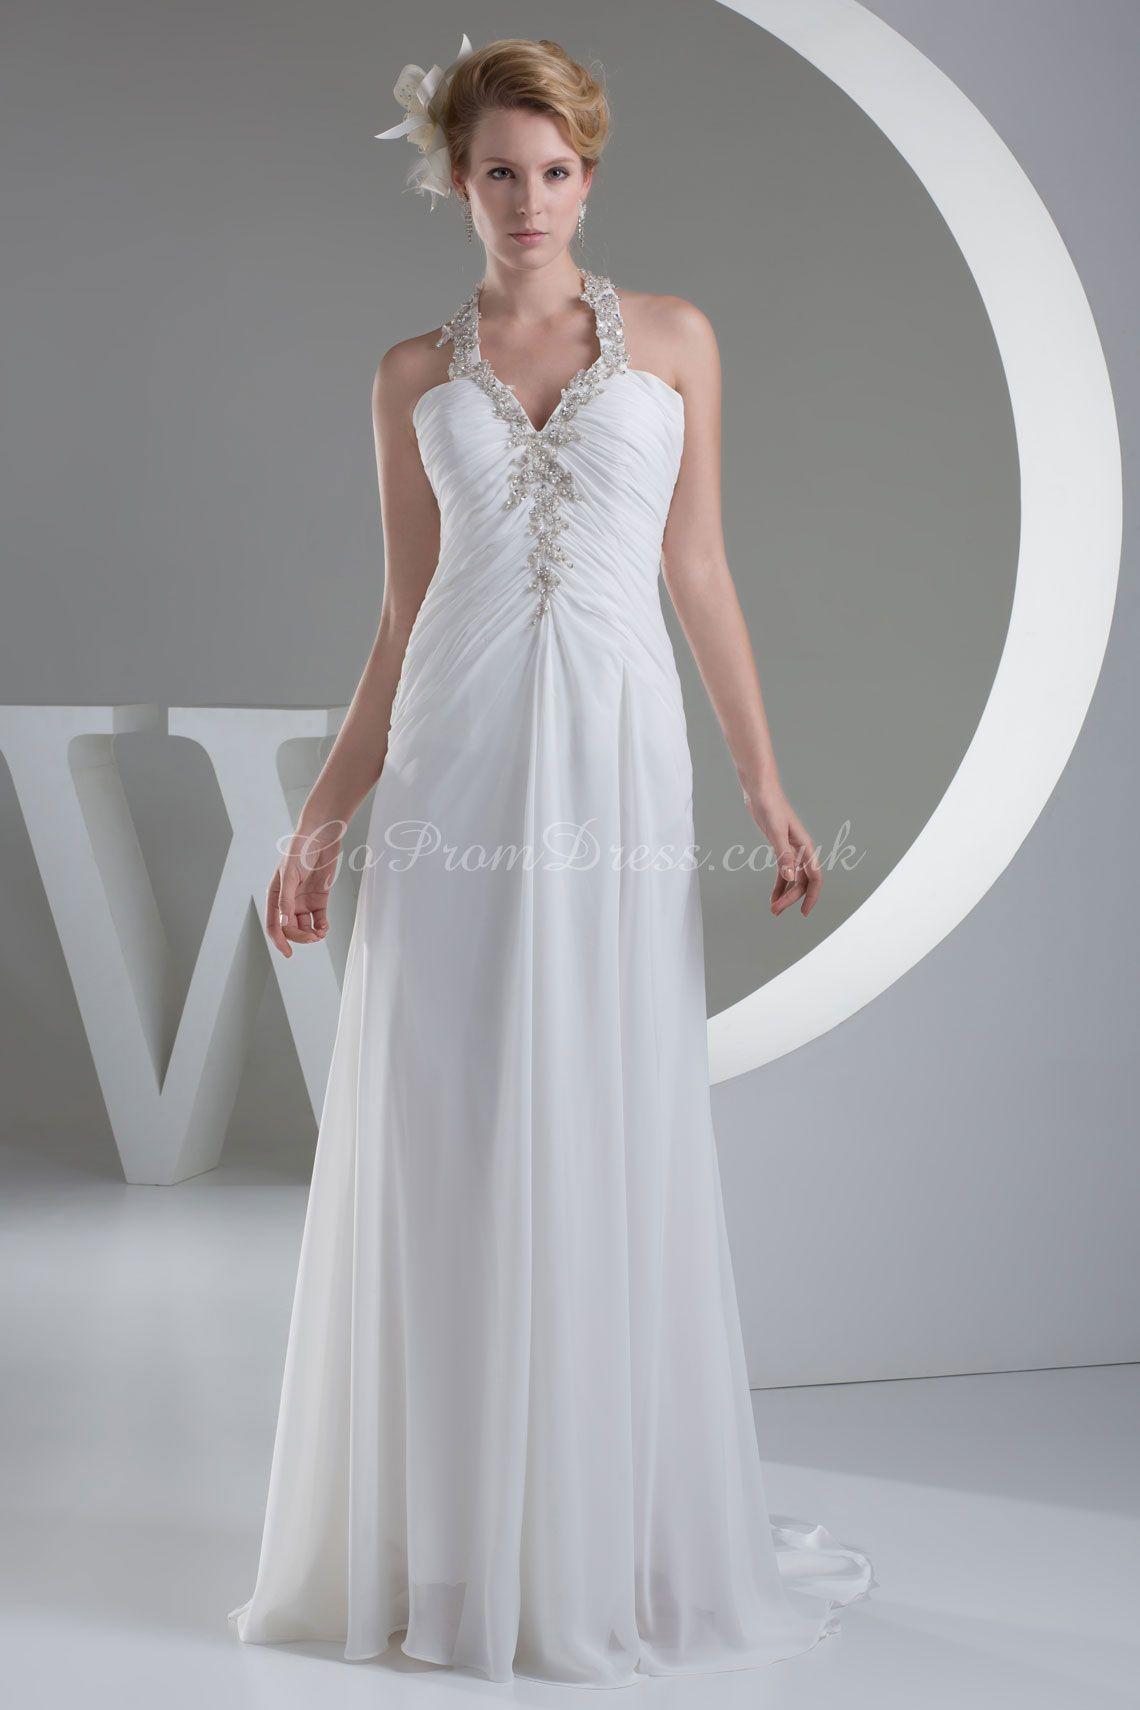 Wedding dresswedding dresseswedding dresswedding dresses aline